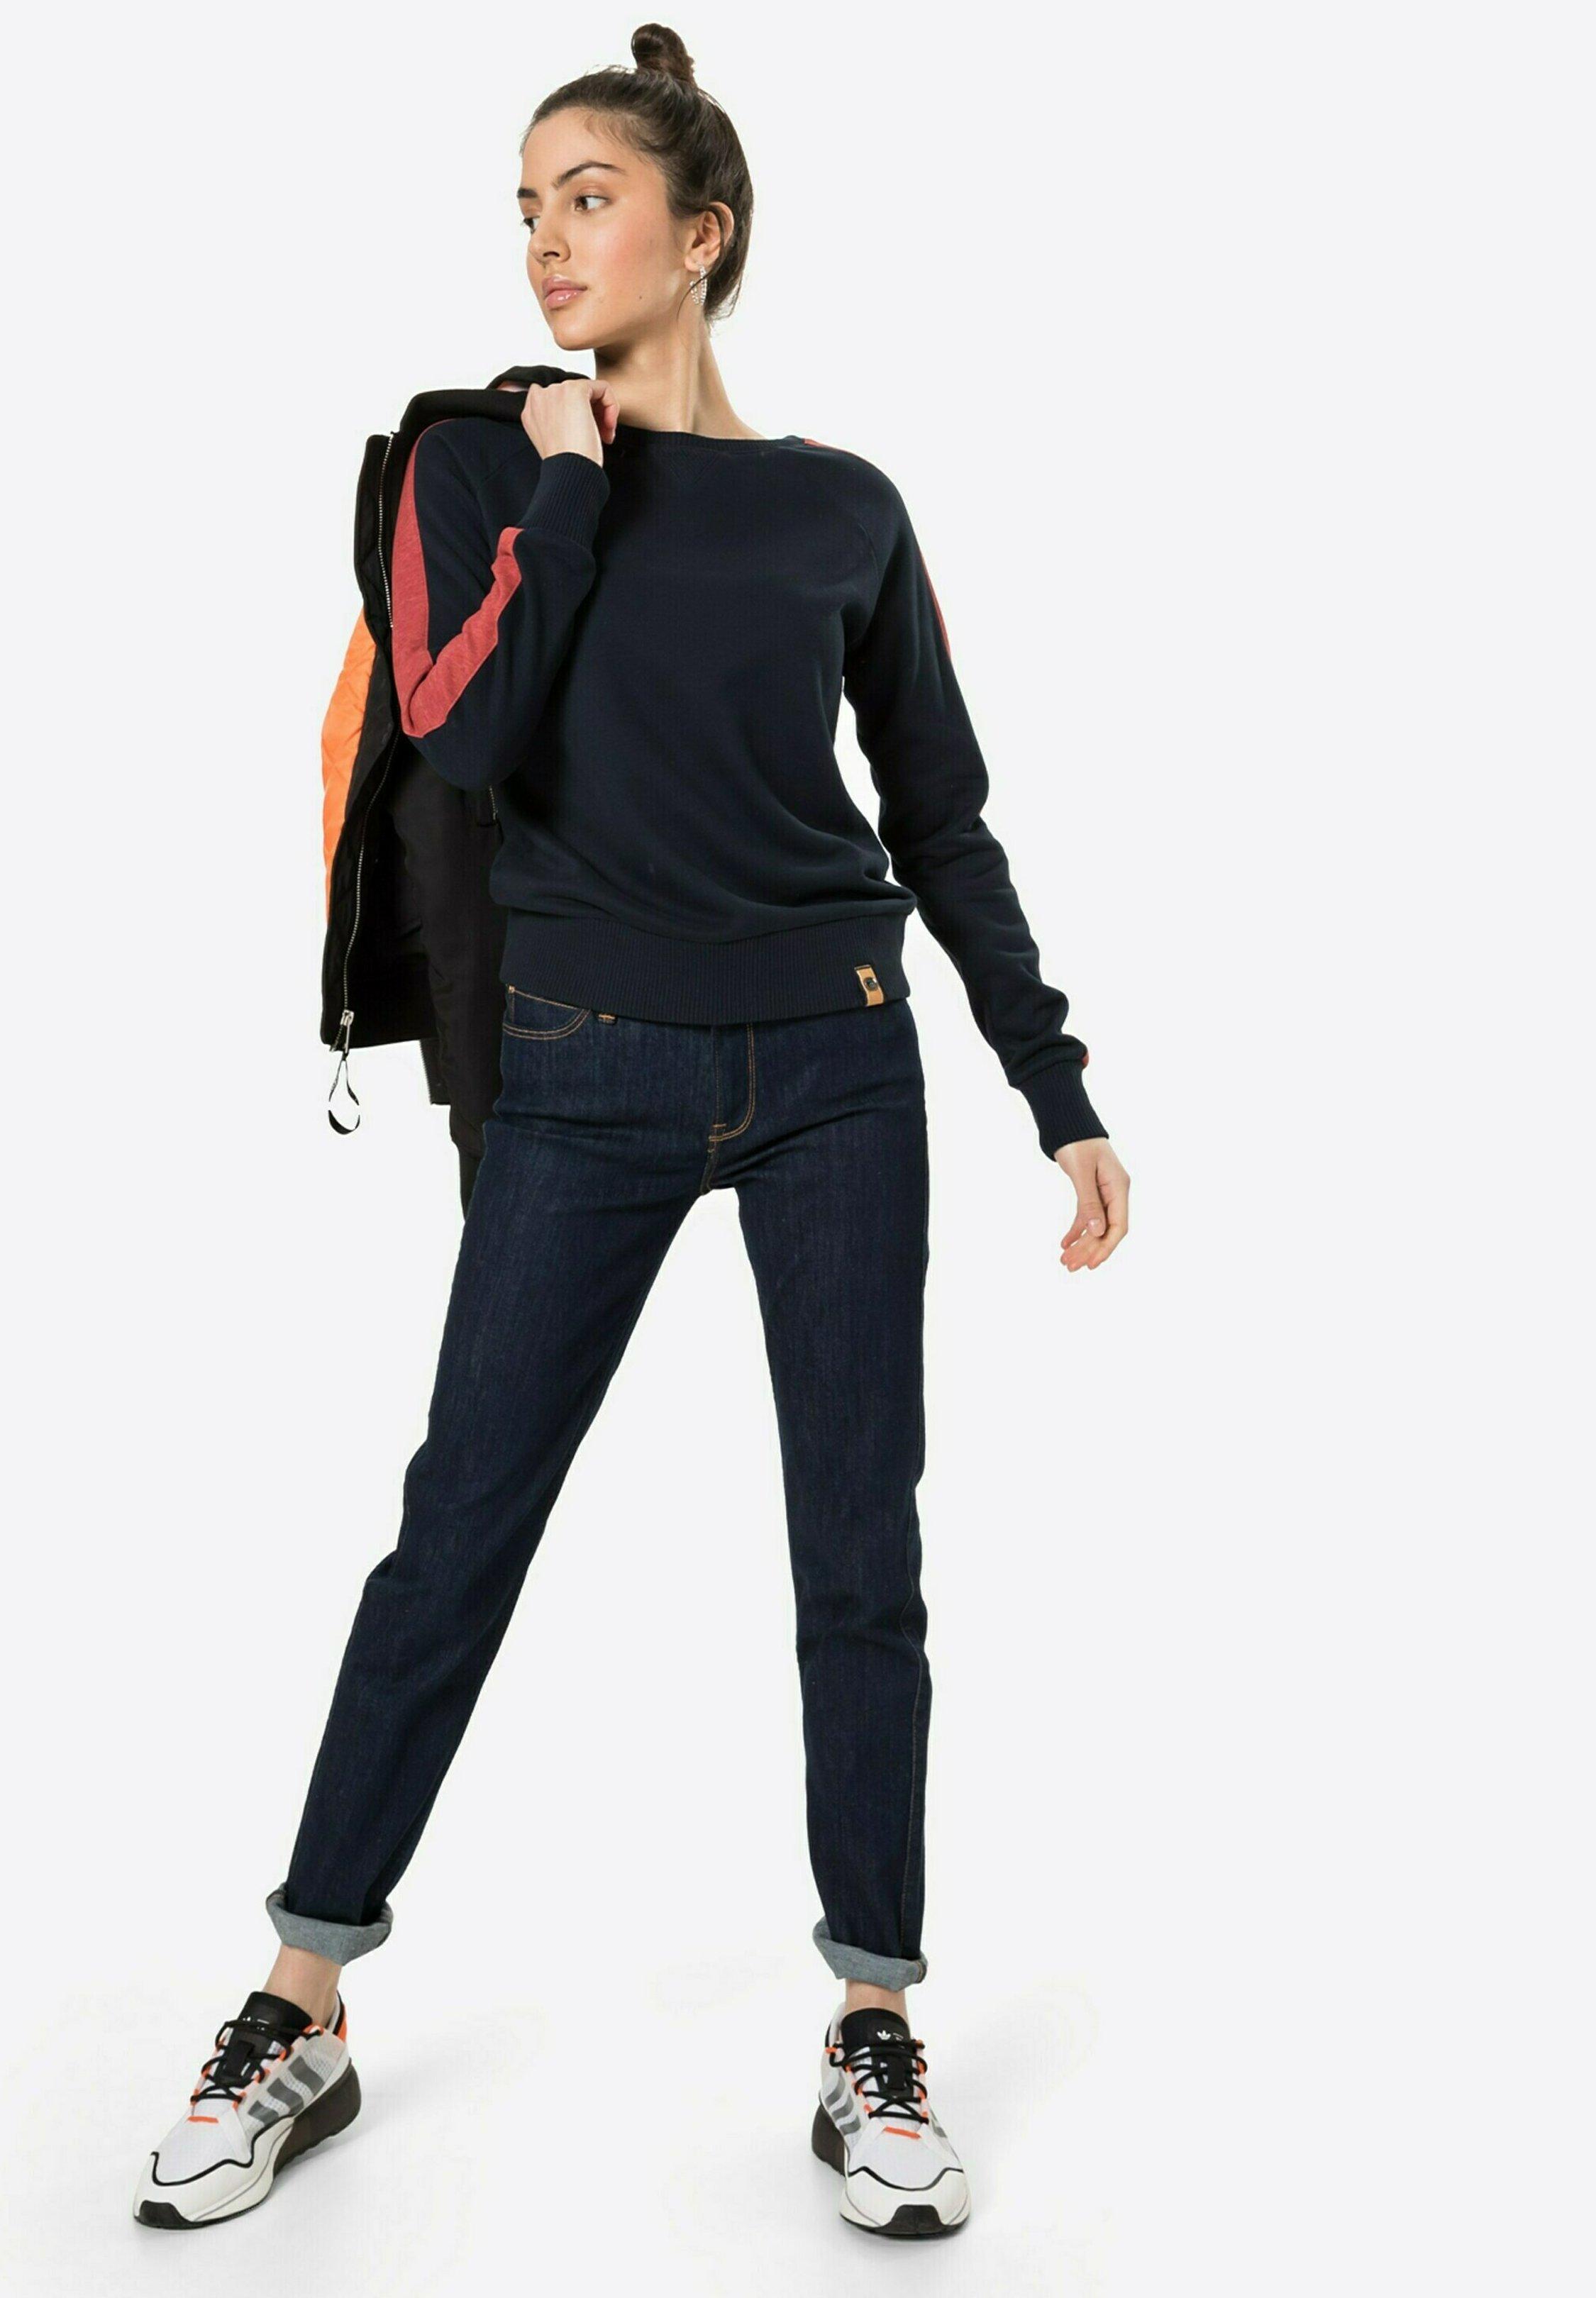 Damen MARY JANE HASE - Sweatshirt